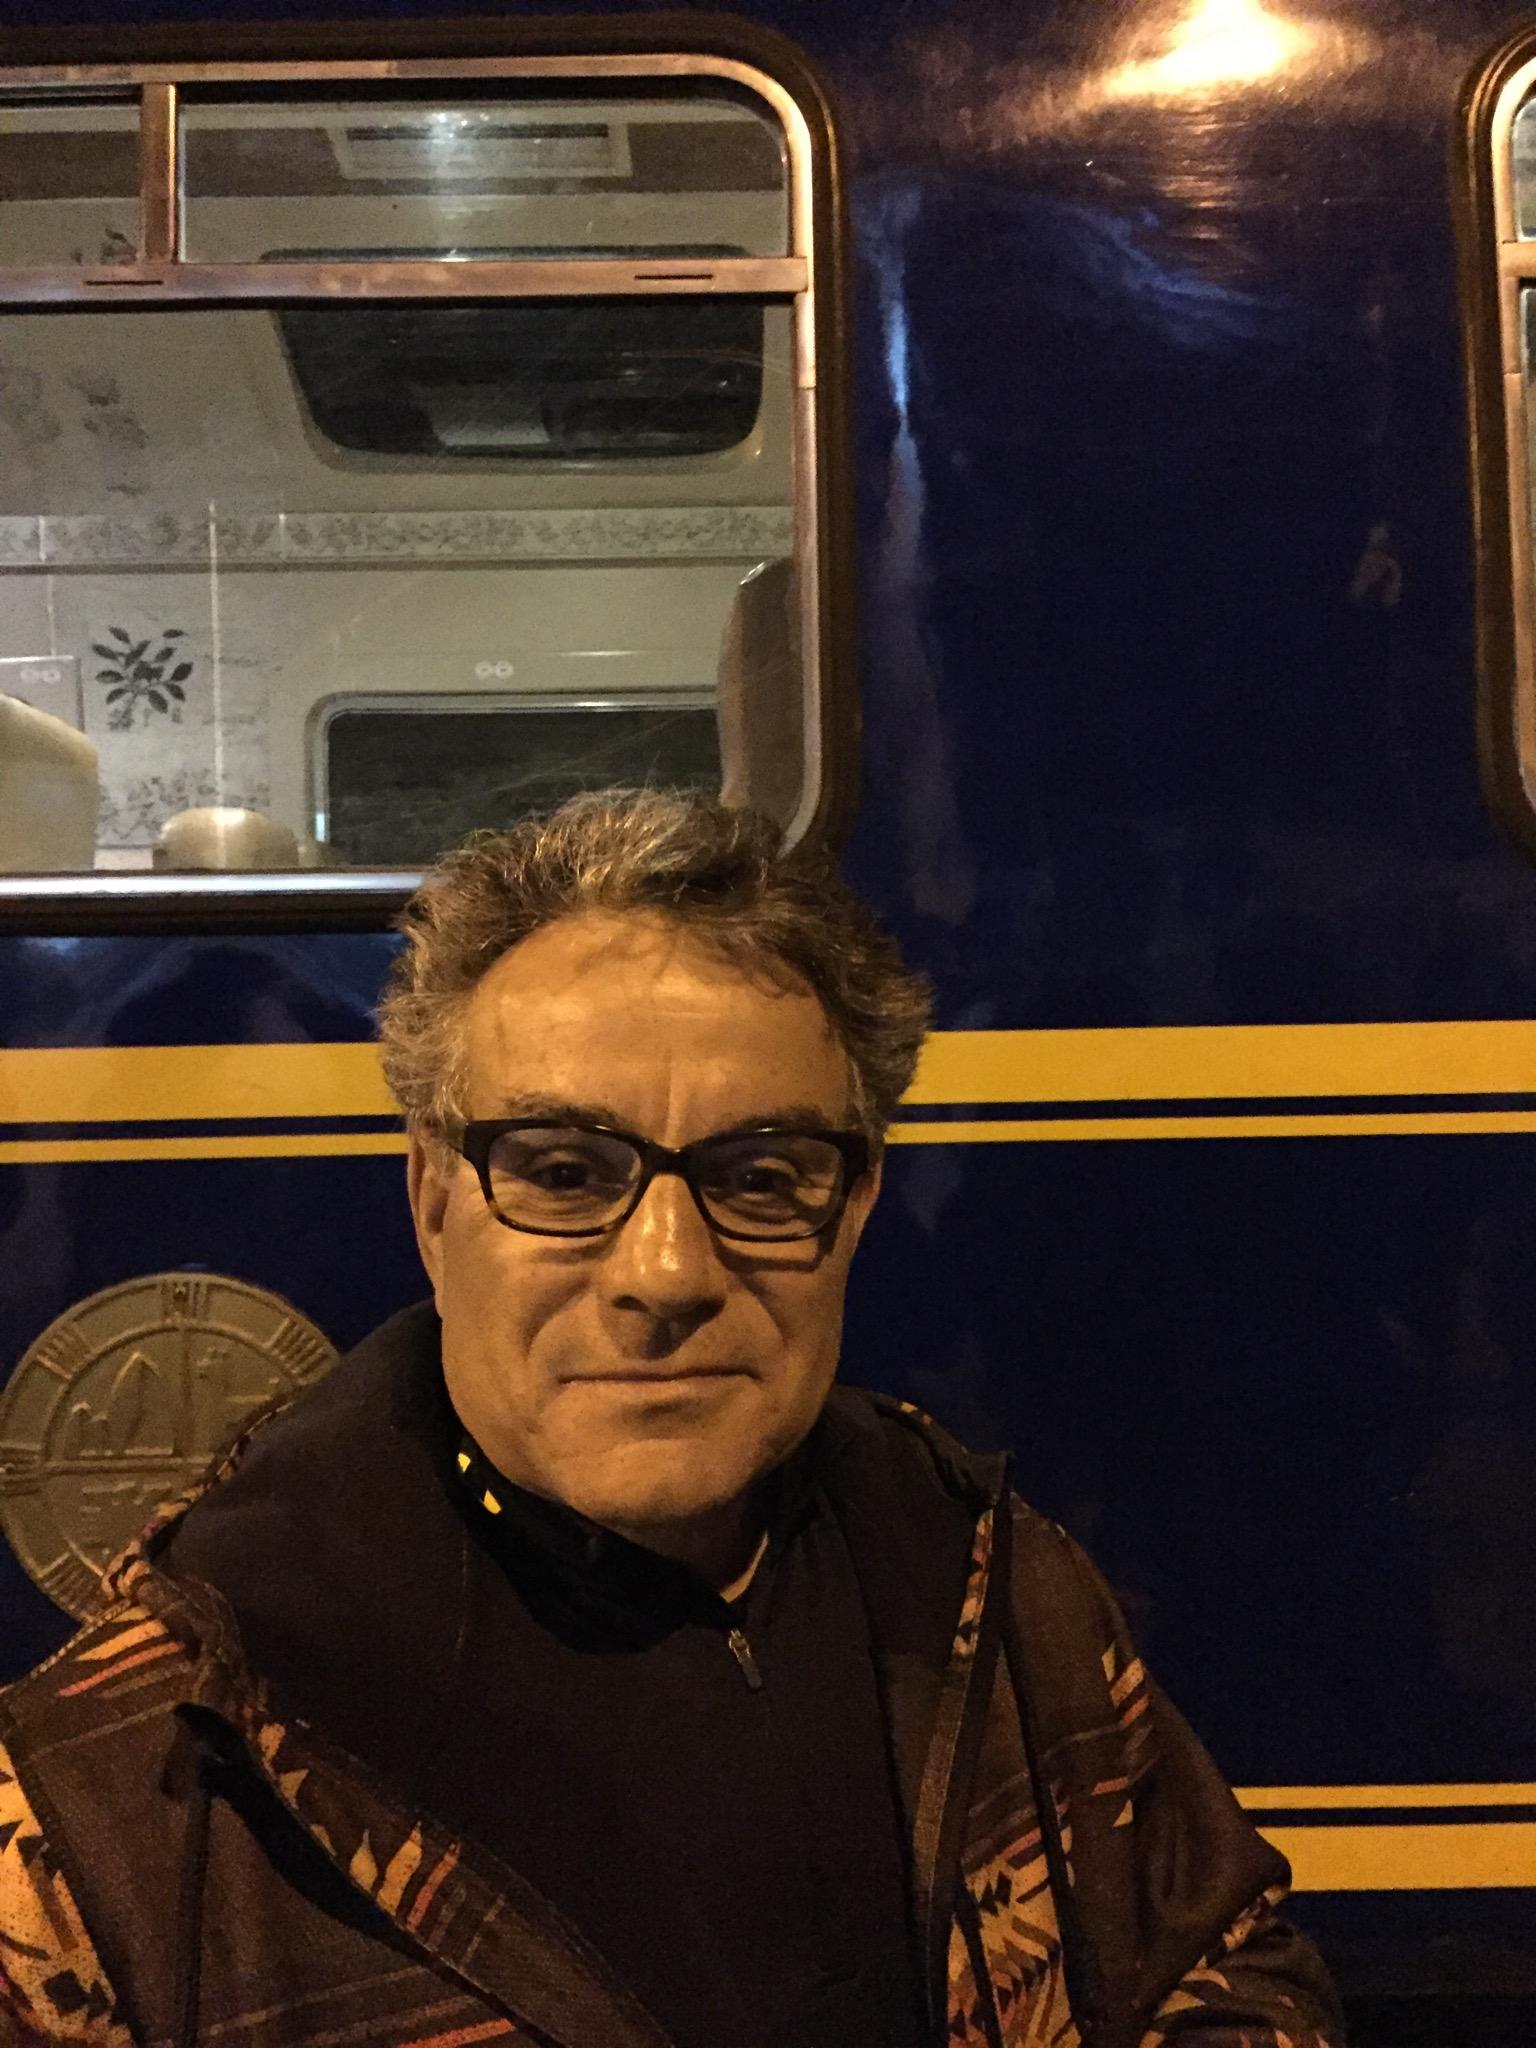 Frank on train